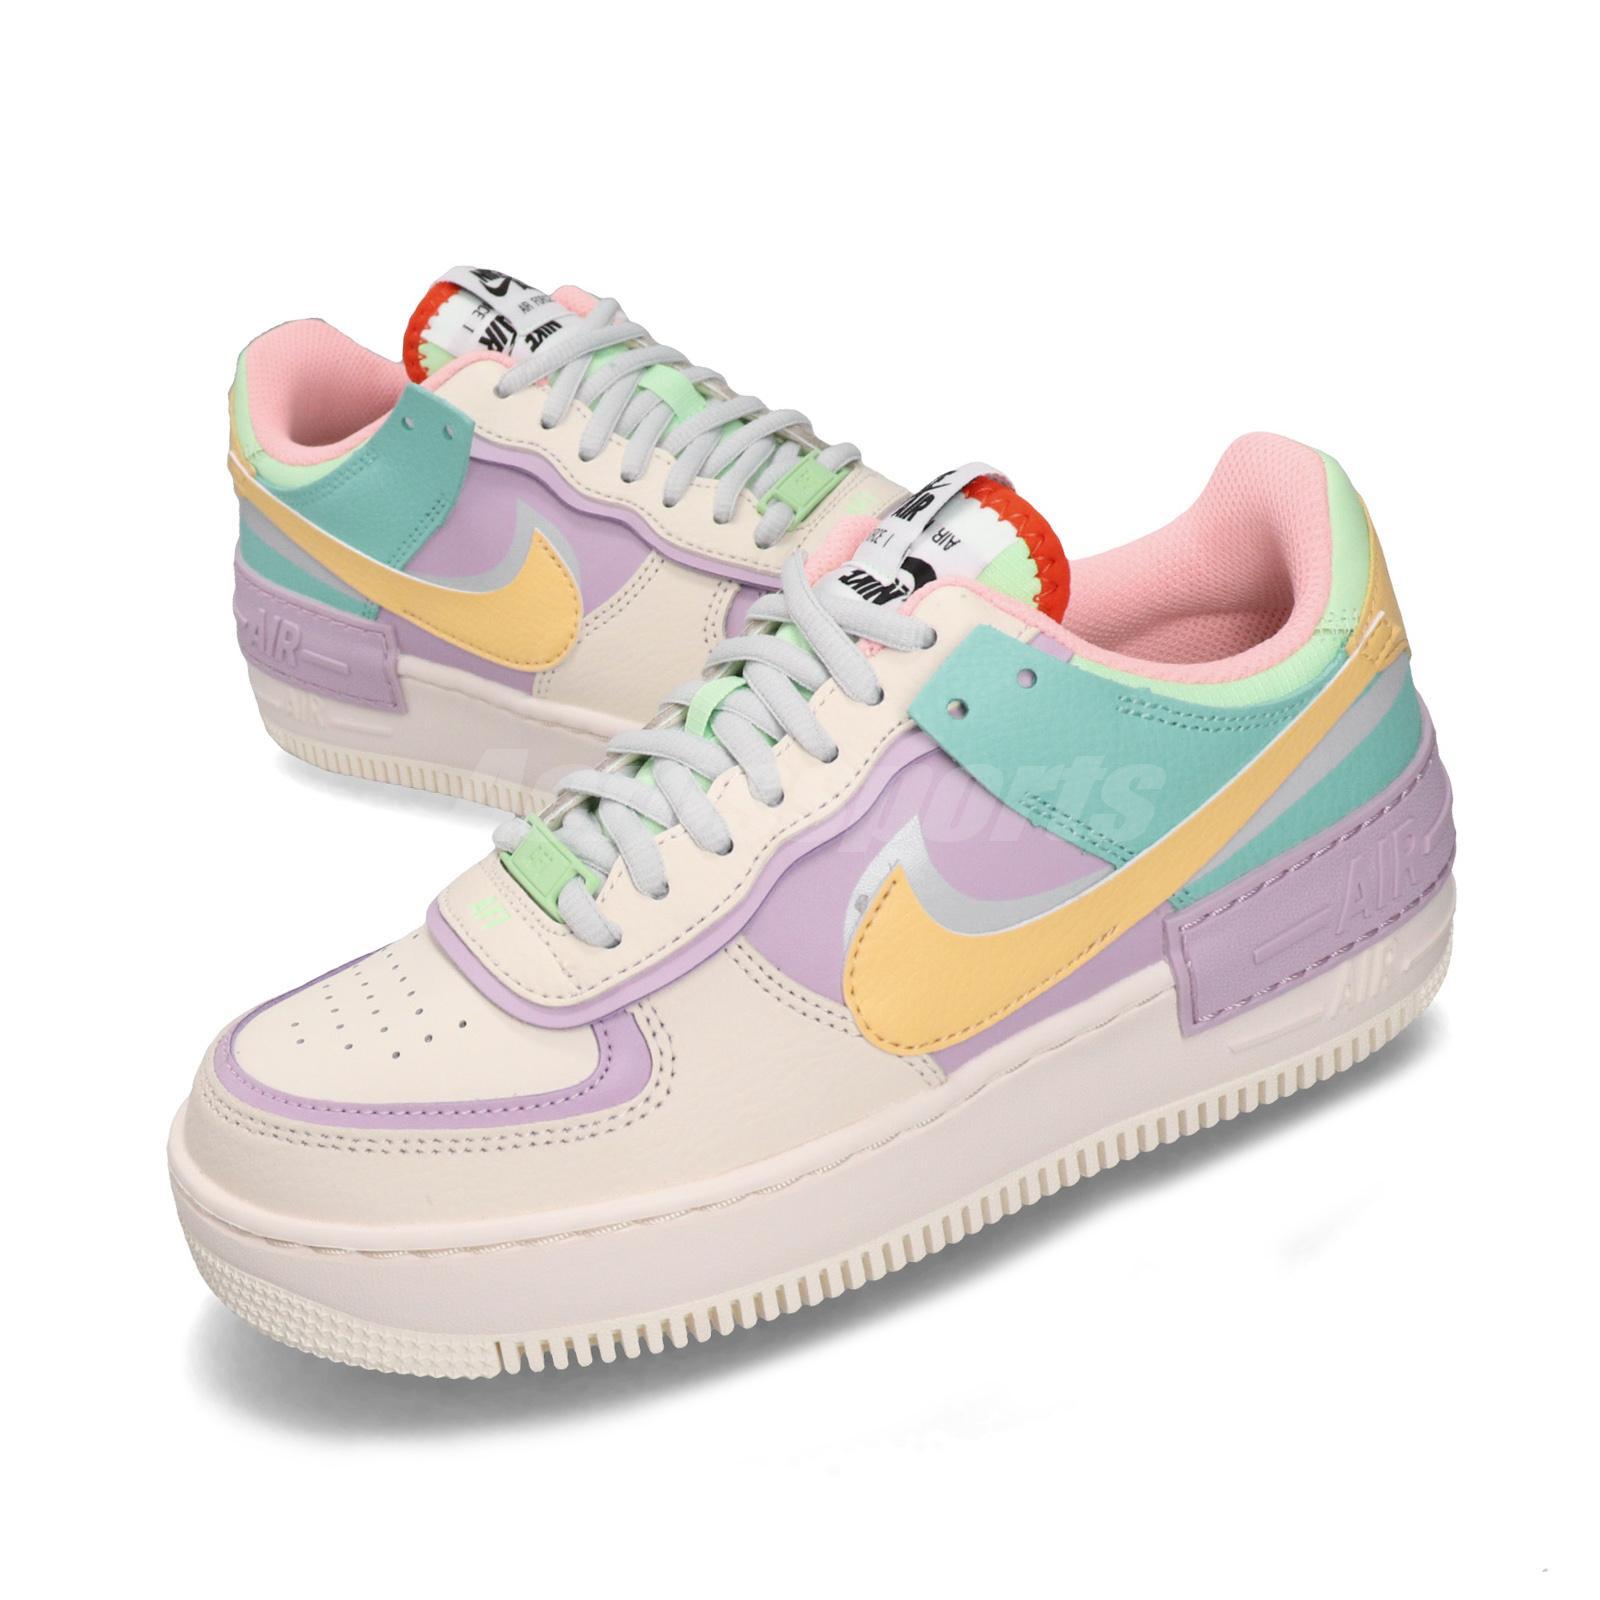 Detalles acerca de Nike Wmns Air Force 1 oculta AF1 púrpura pálida Marfil De Oro Mujer Zapatos CI0919 101 mostrar título original